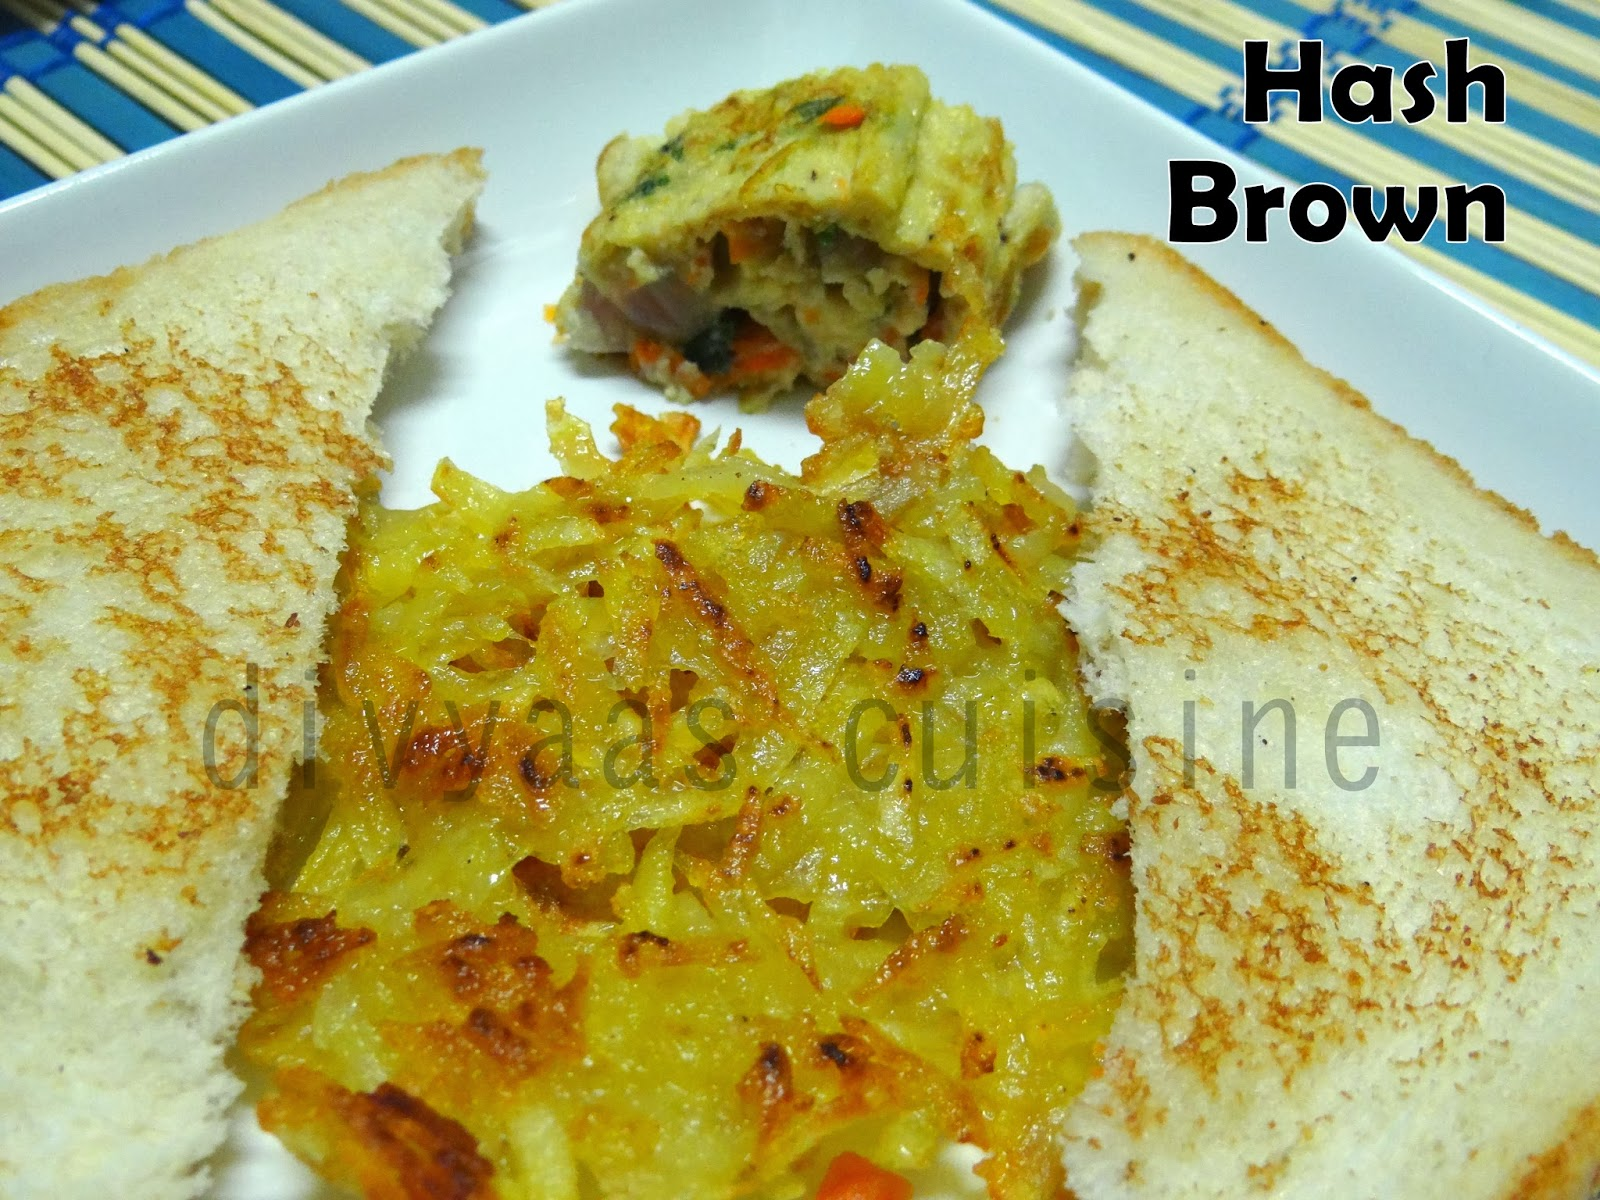 Hash Brown Potato Fry Egg Omelet Roll Bread Roast